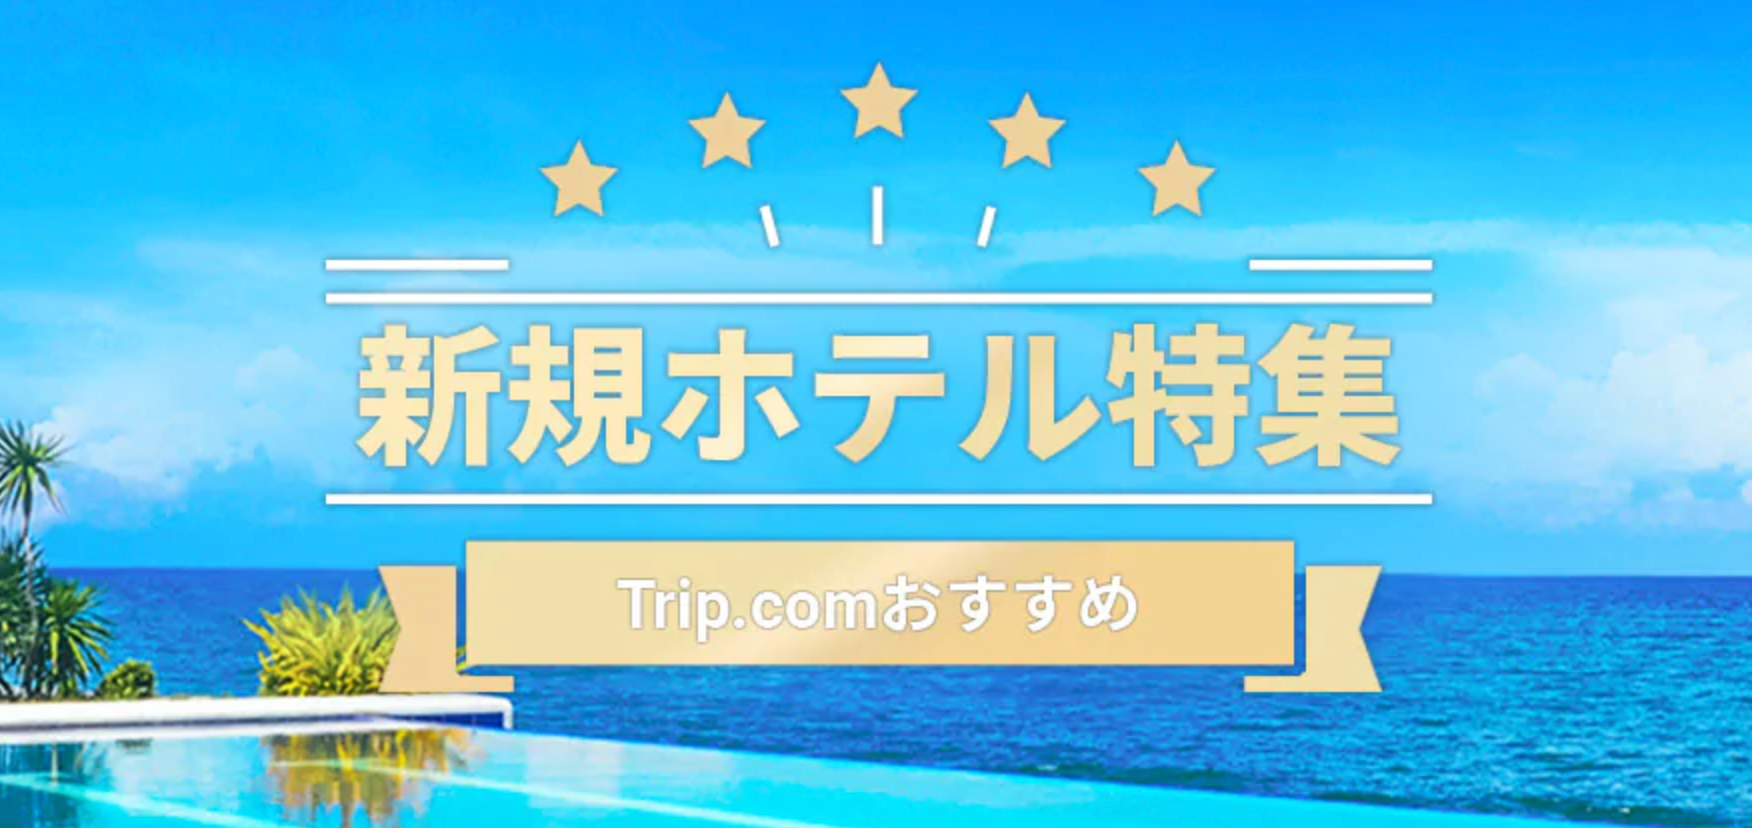 Trip.comの国内・海外の新規オープンホテル・宿特集